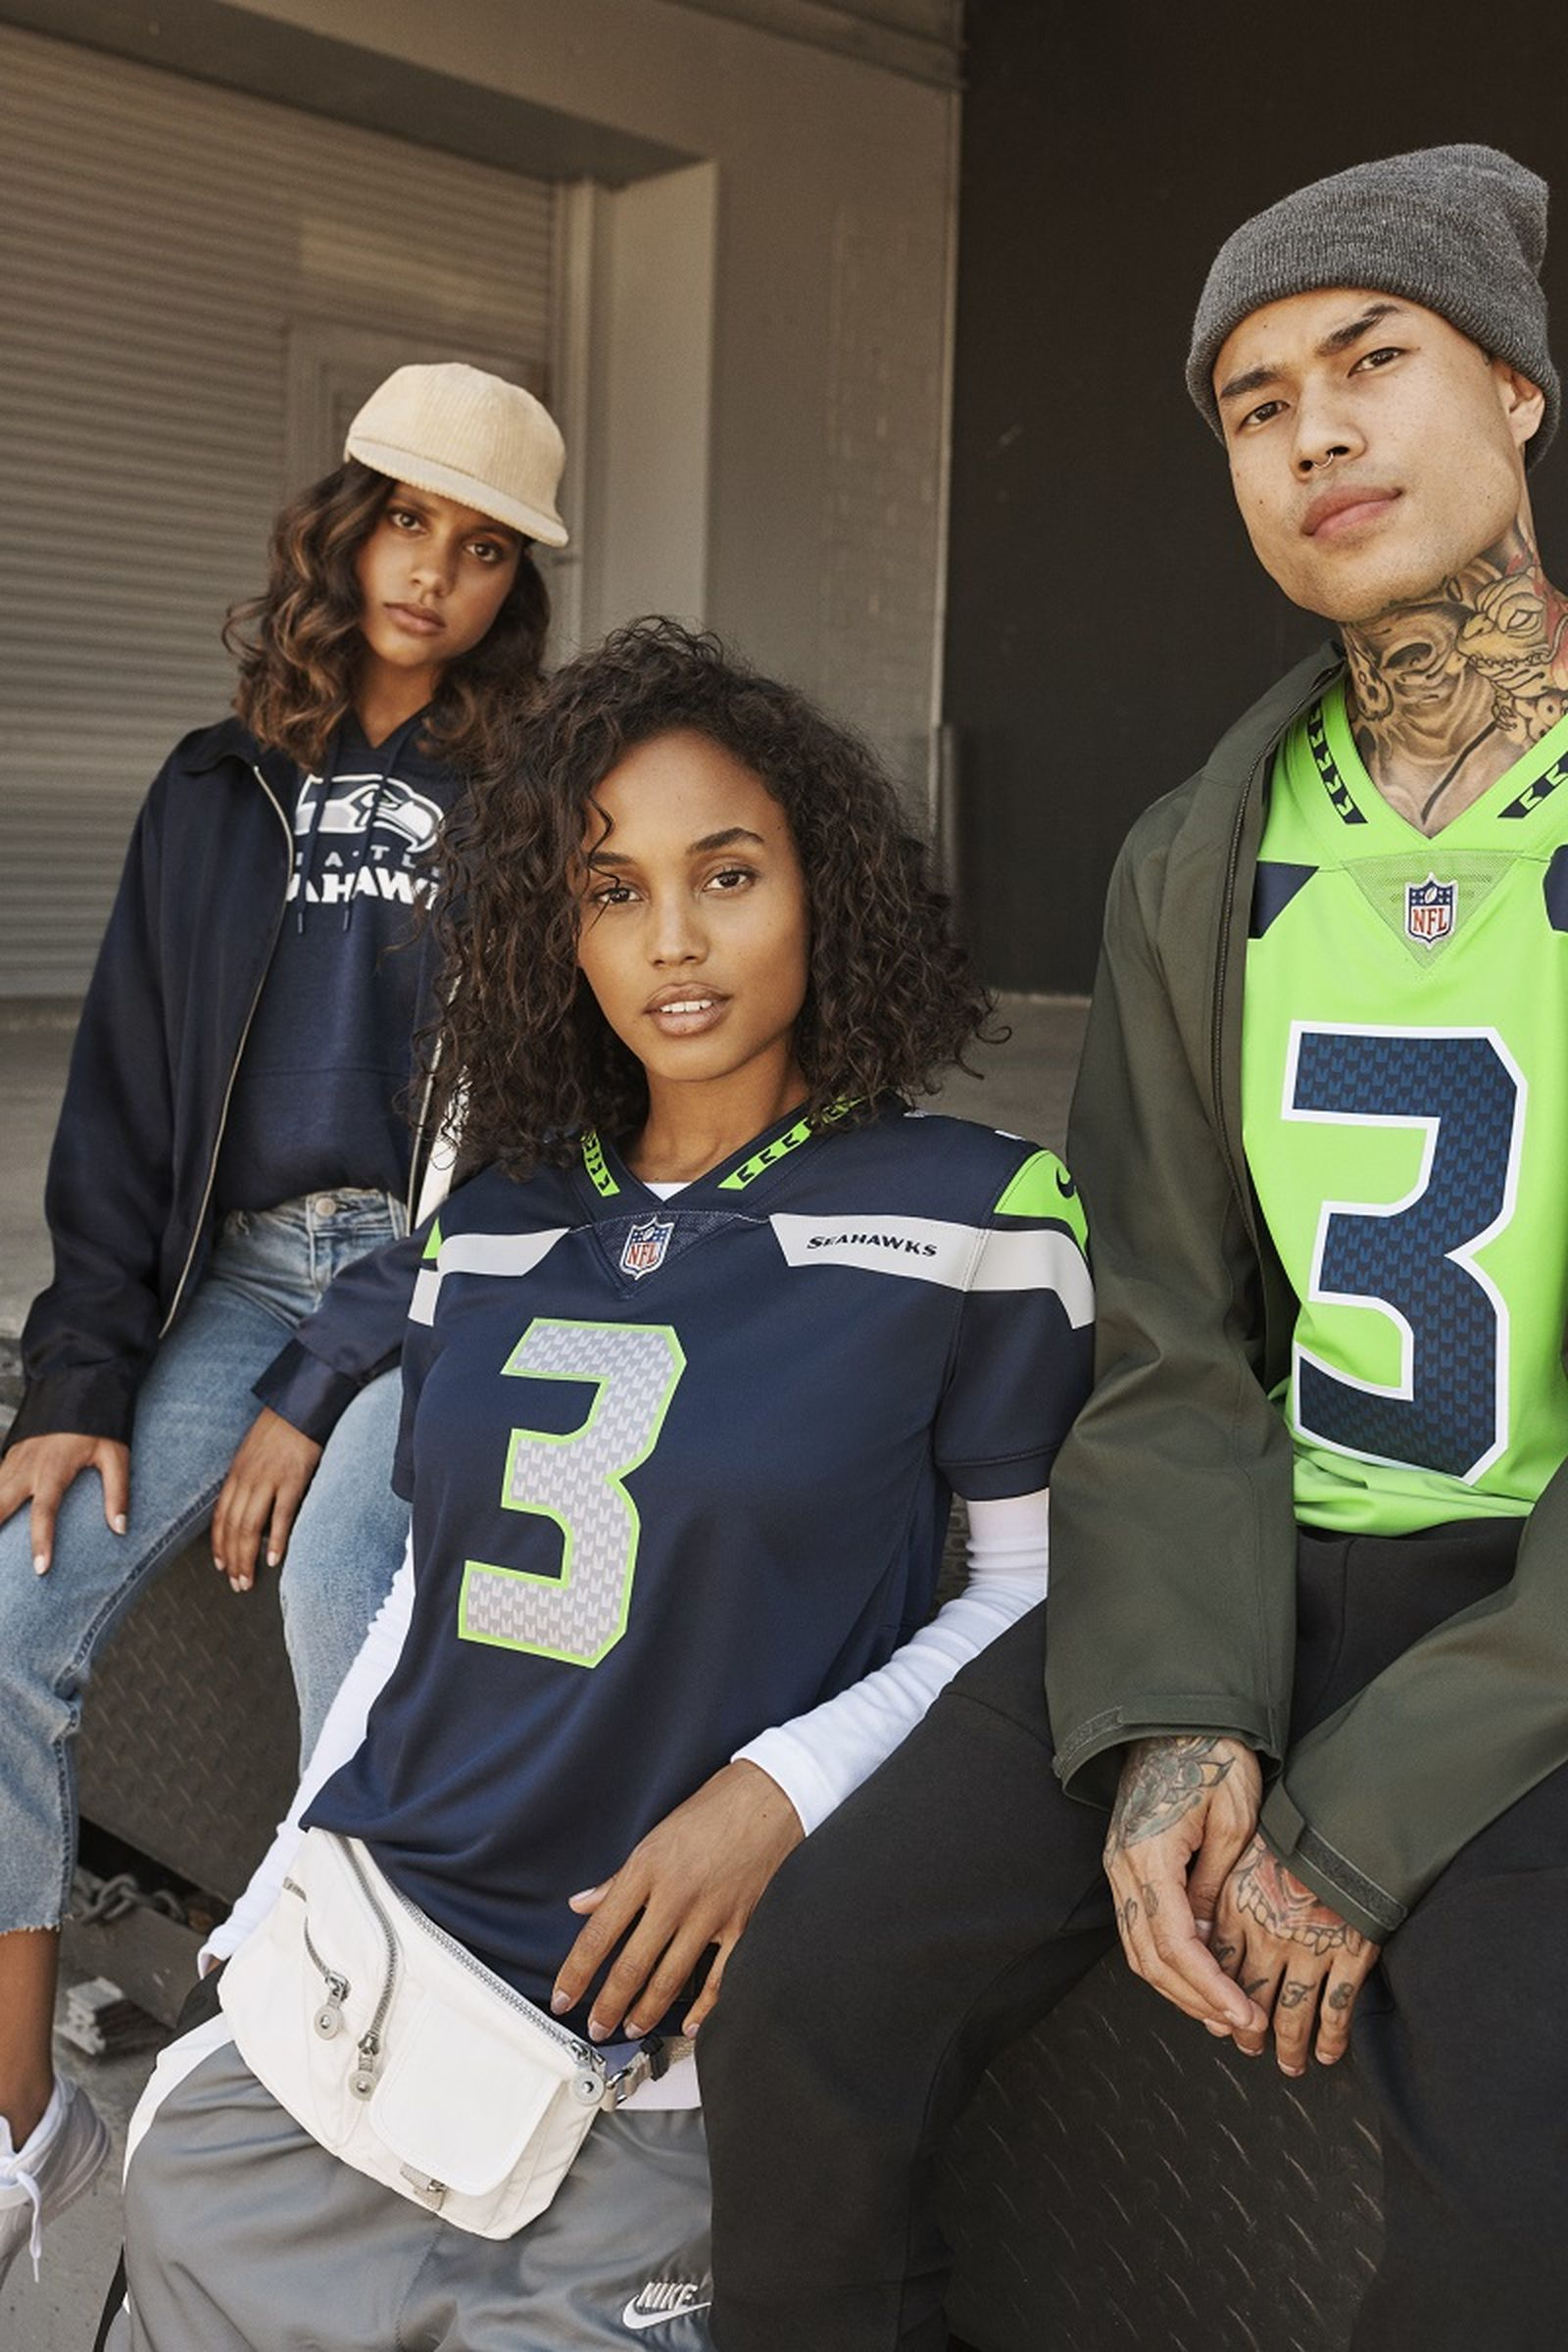 FA18 NFB NA NFL SEAHAWKS FANGEAR 0677 Nike